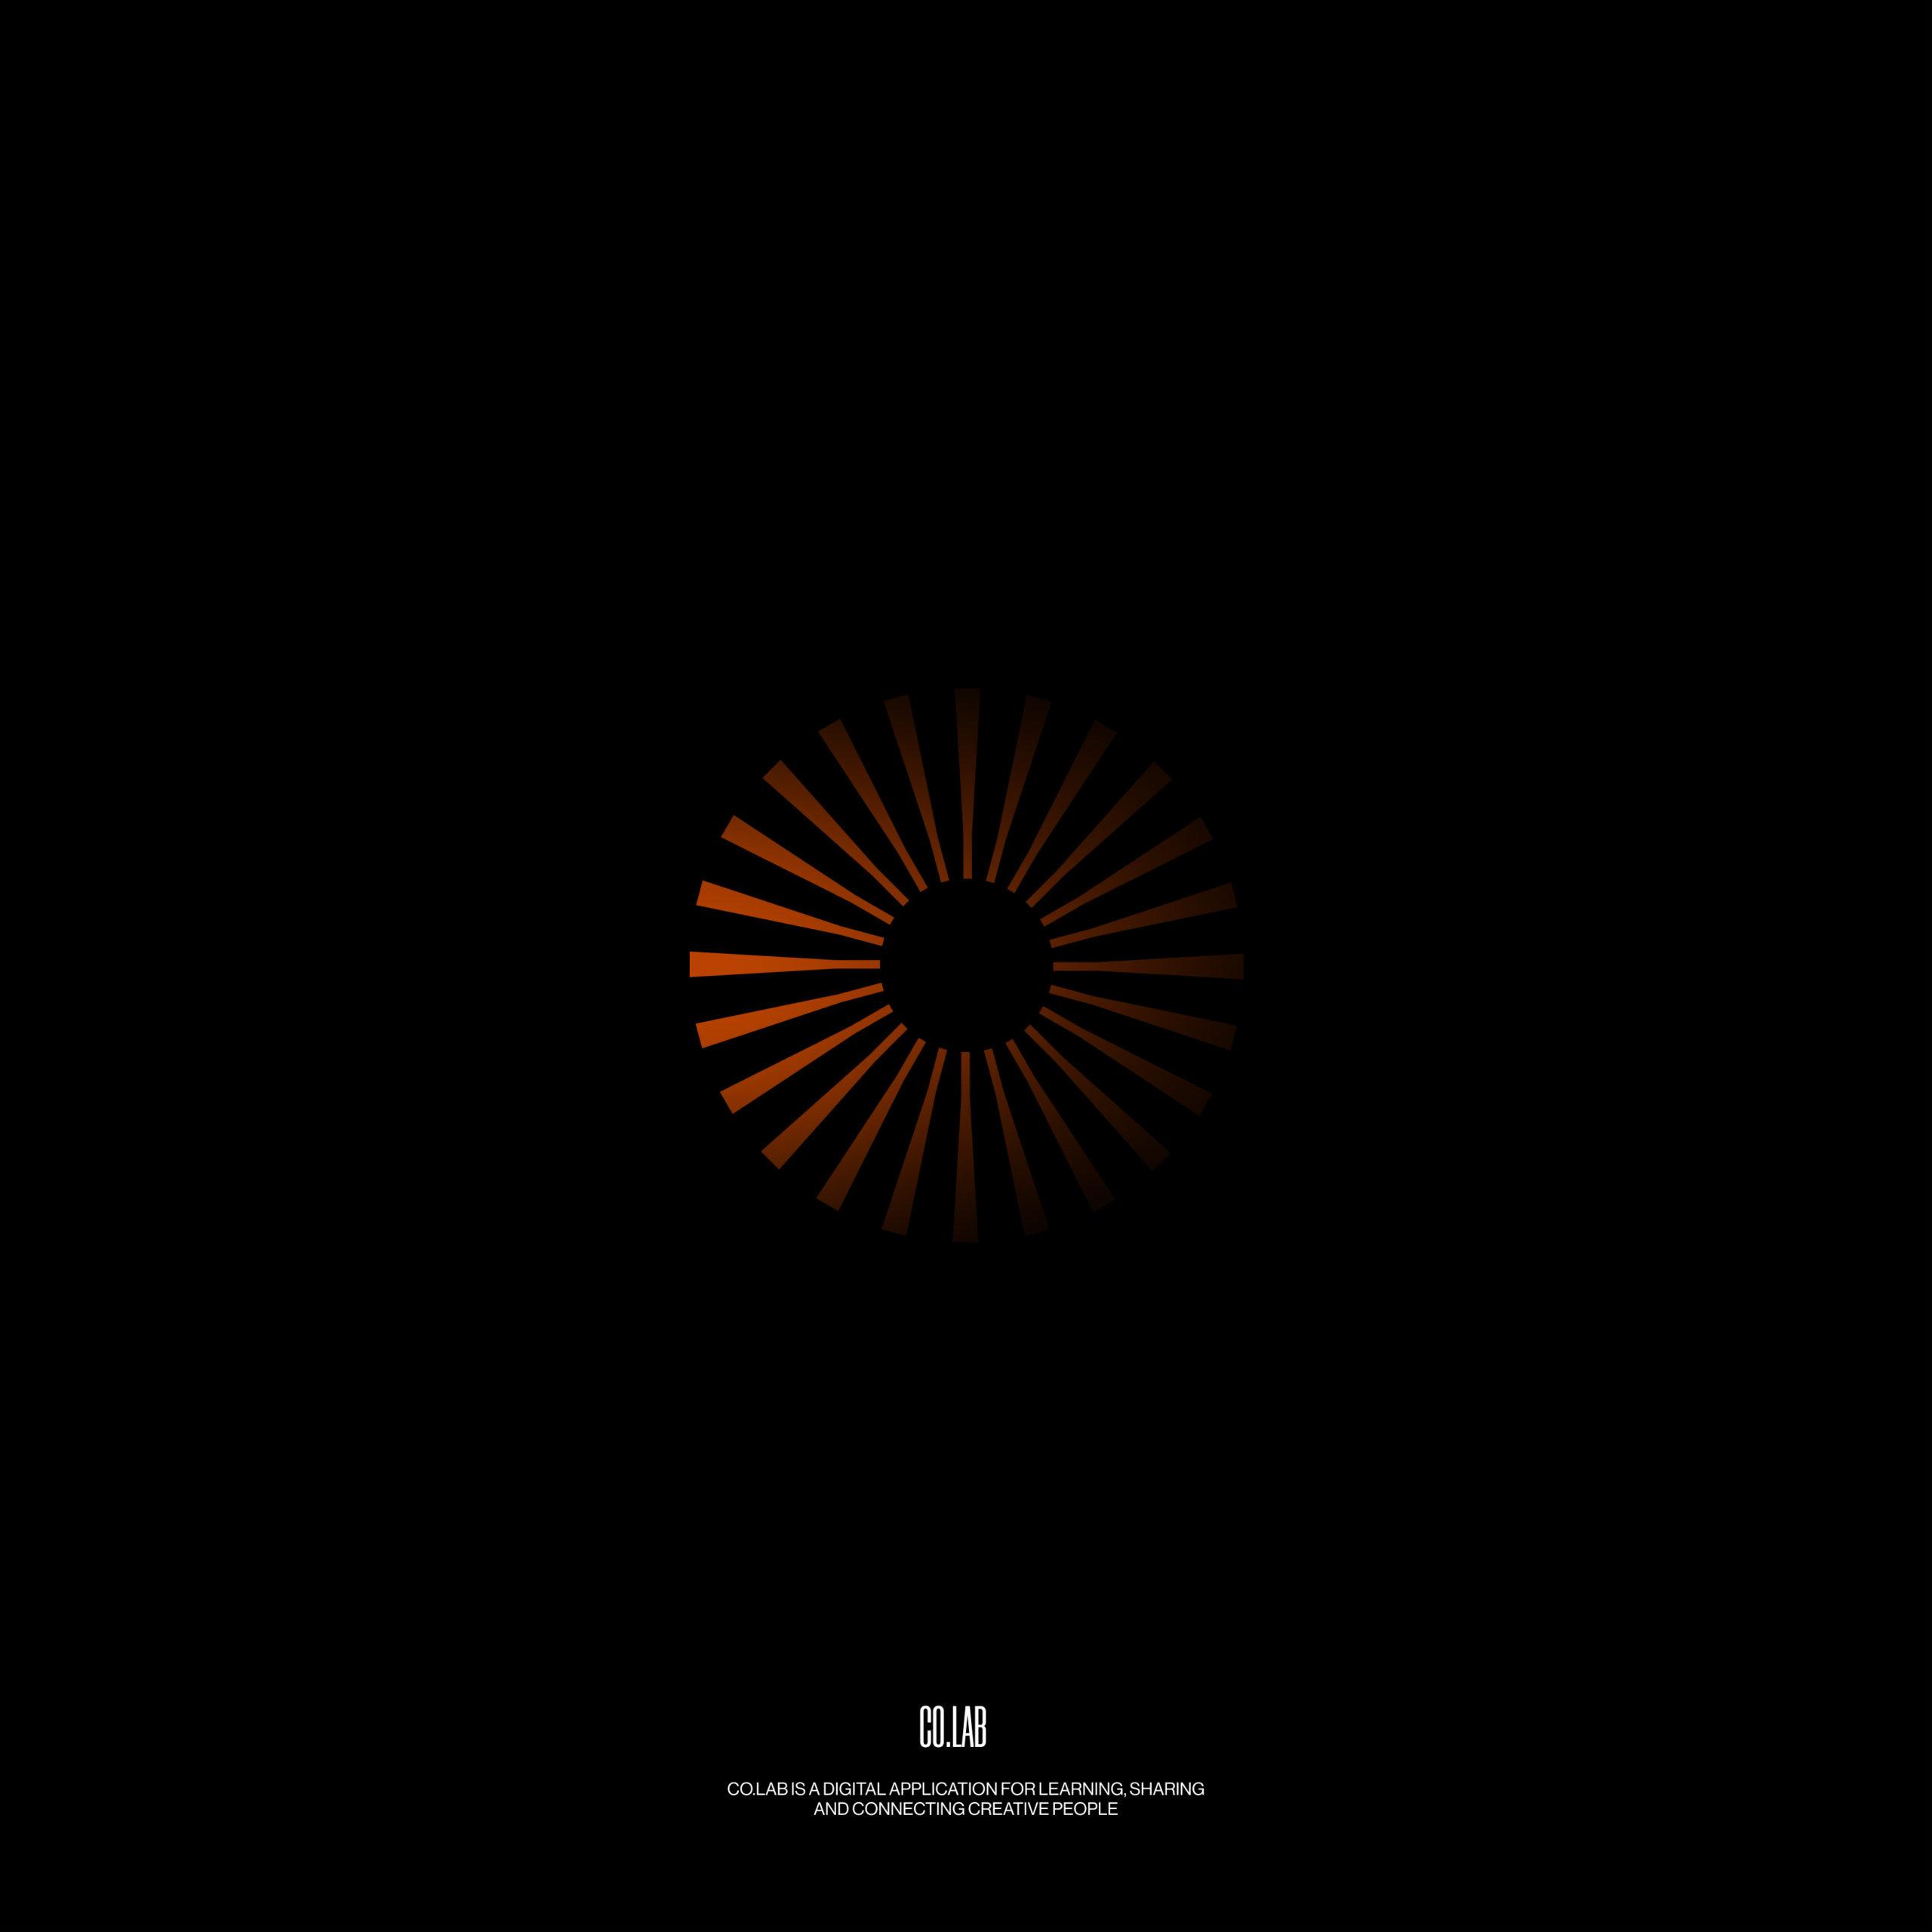 co.lab-symbol